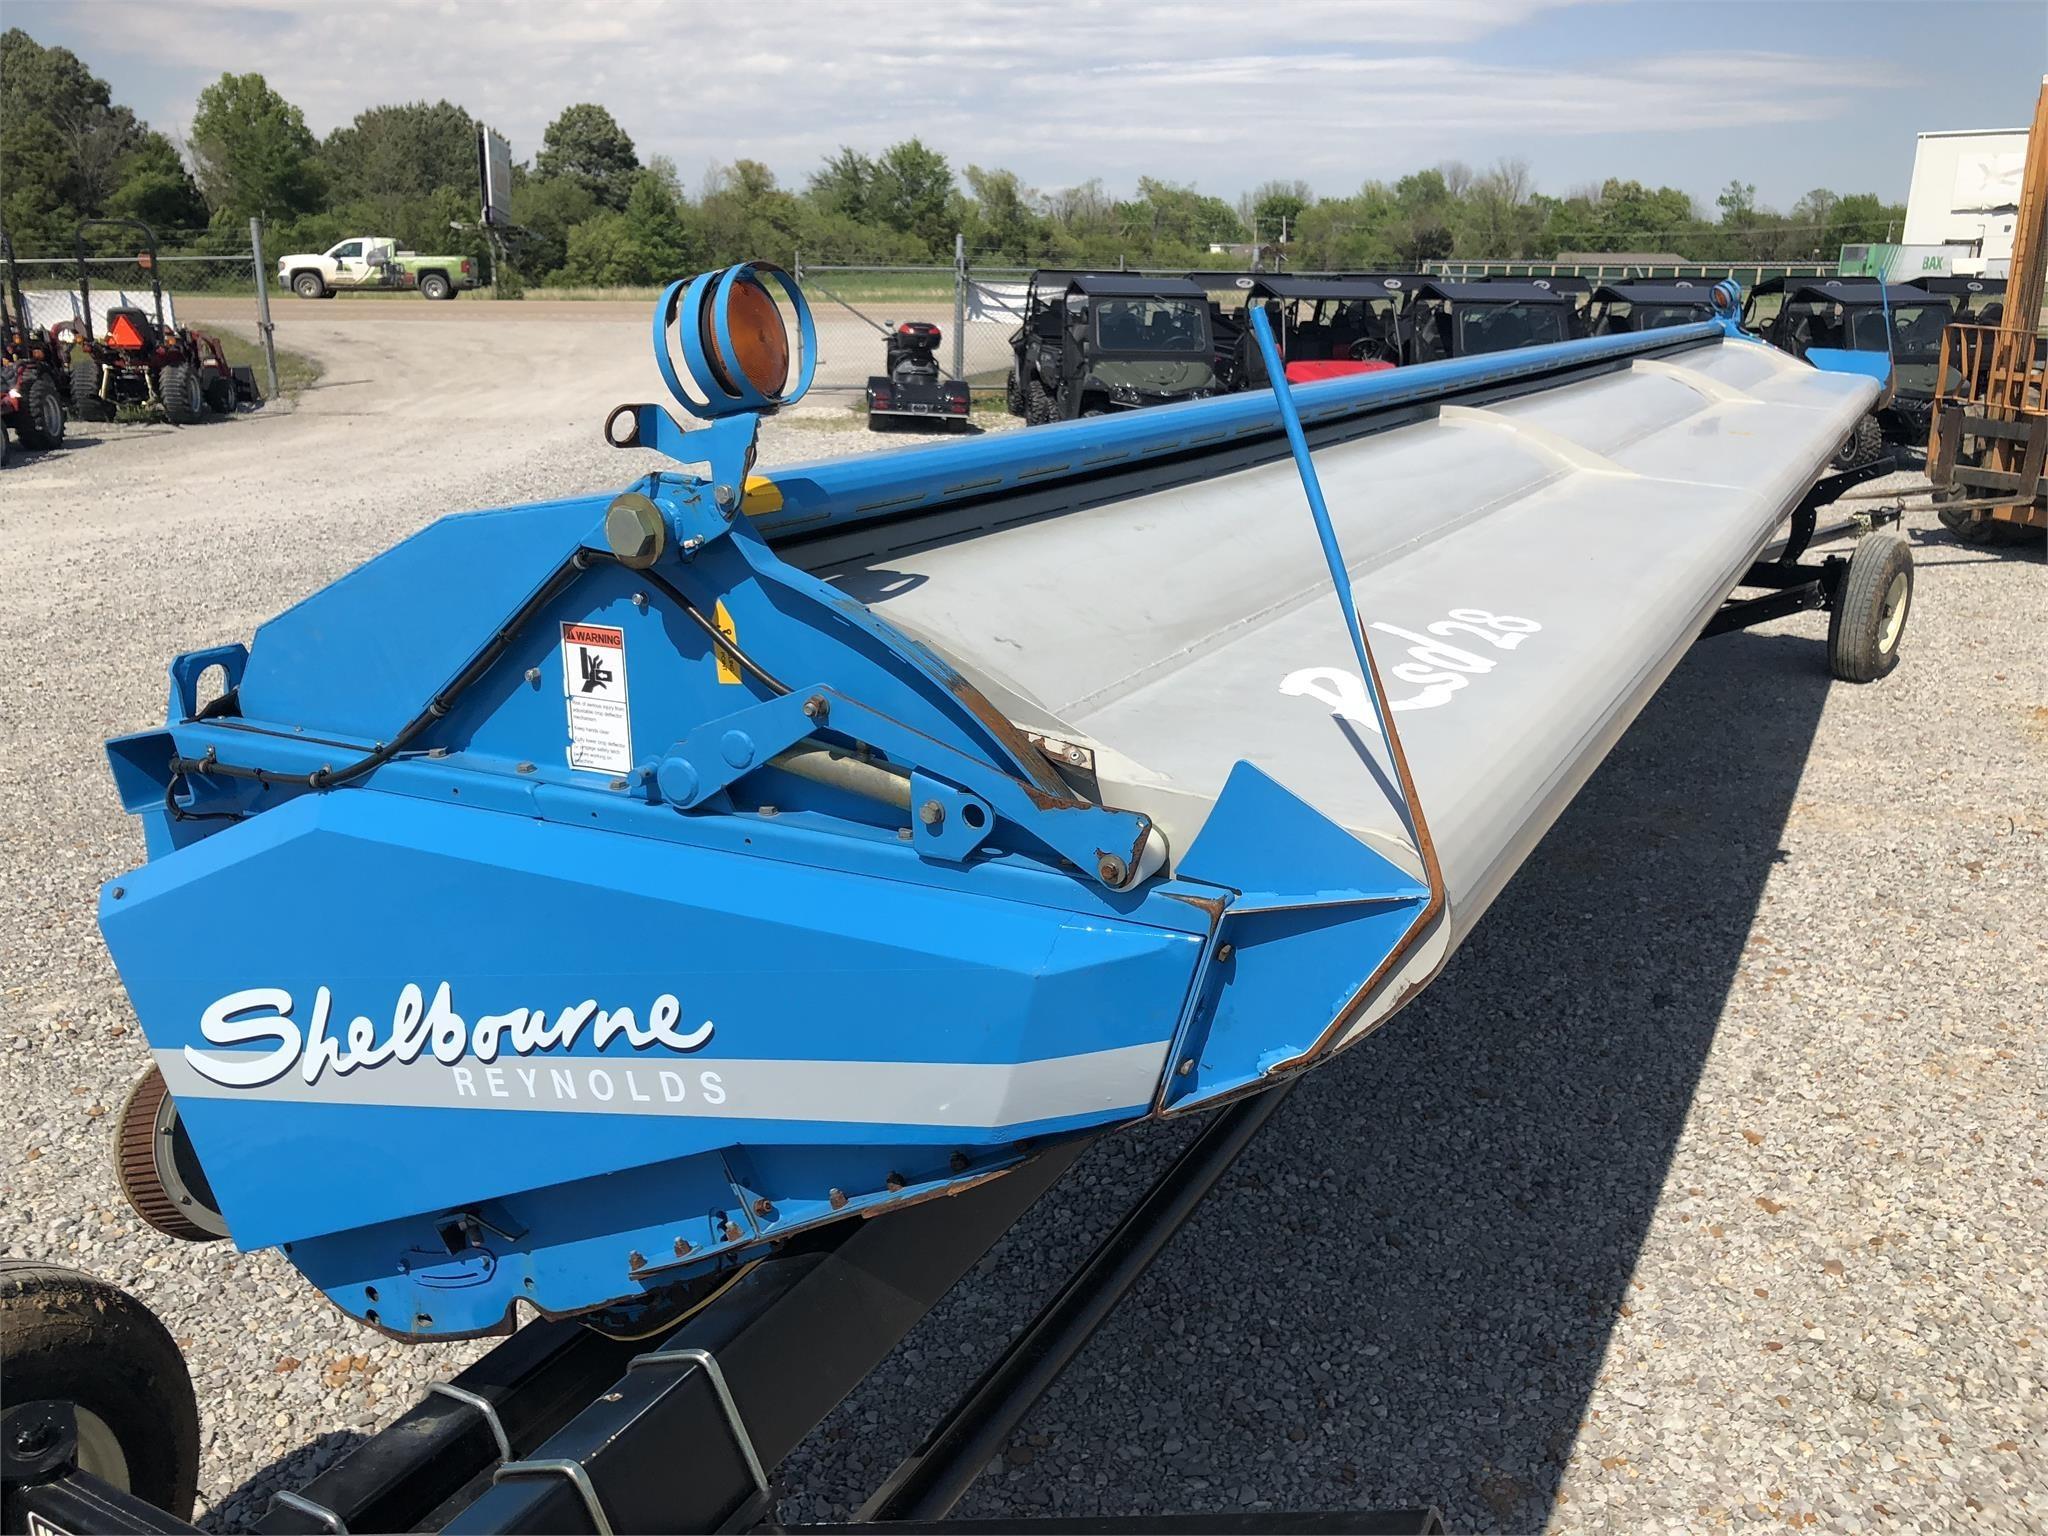 2011 Shelbourne Reynolds RSD28 Platform